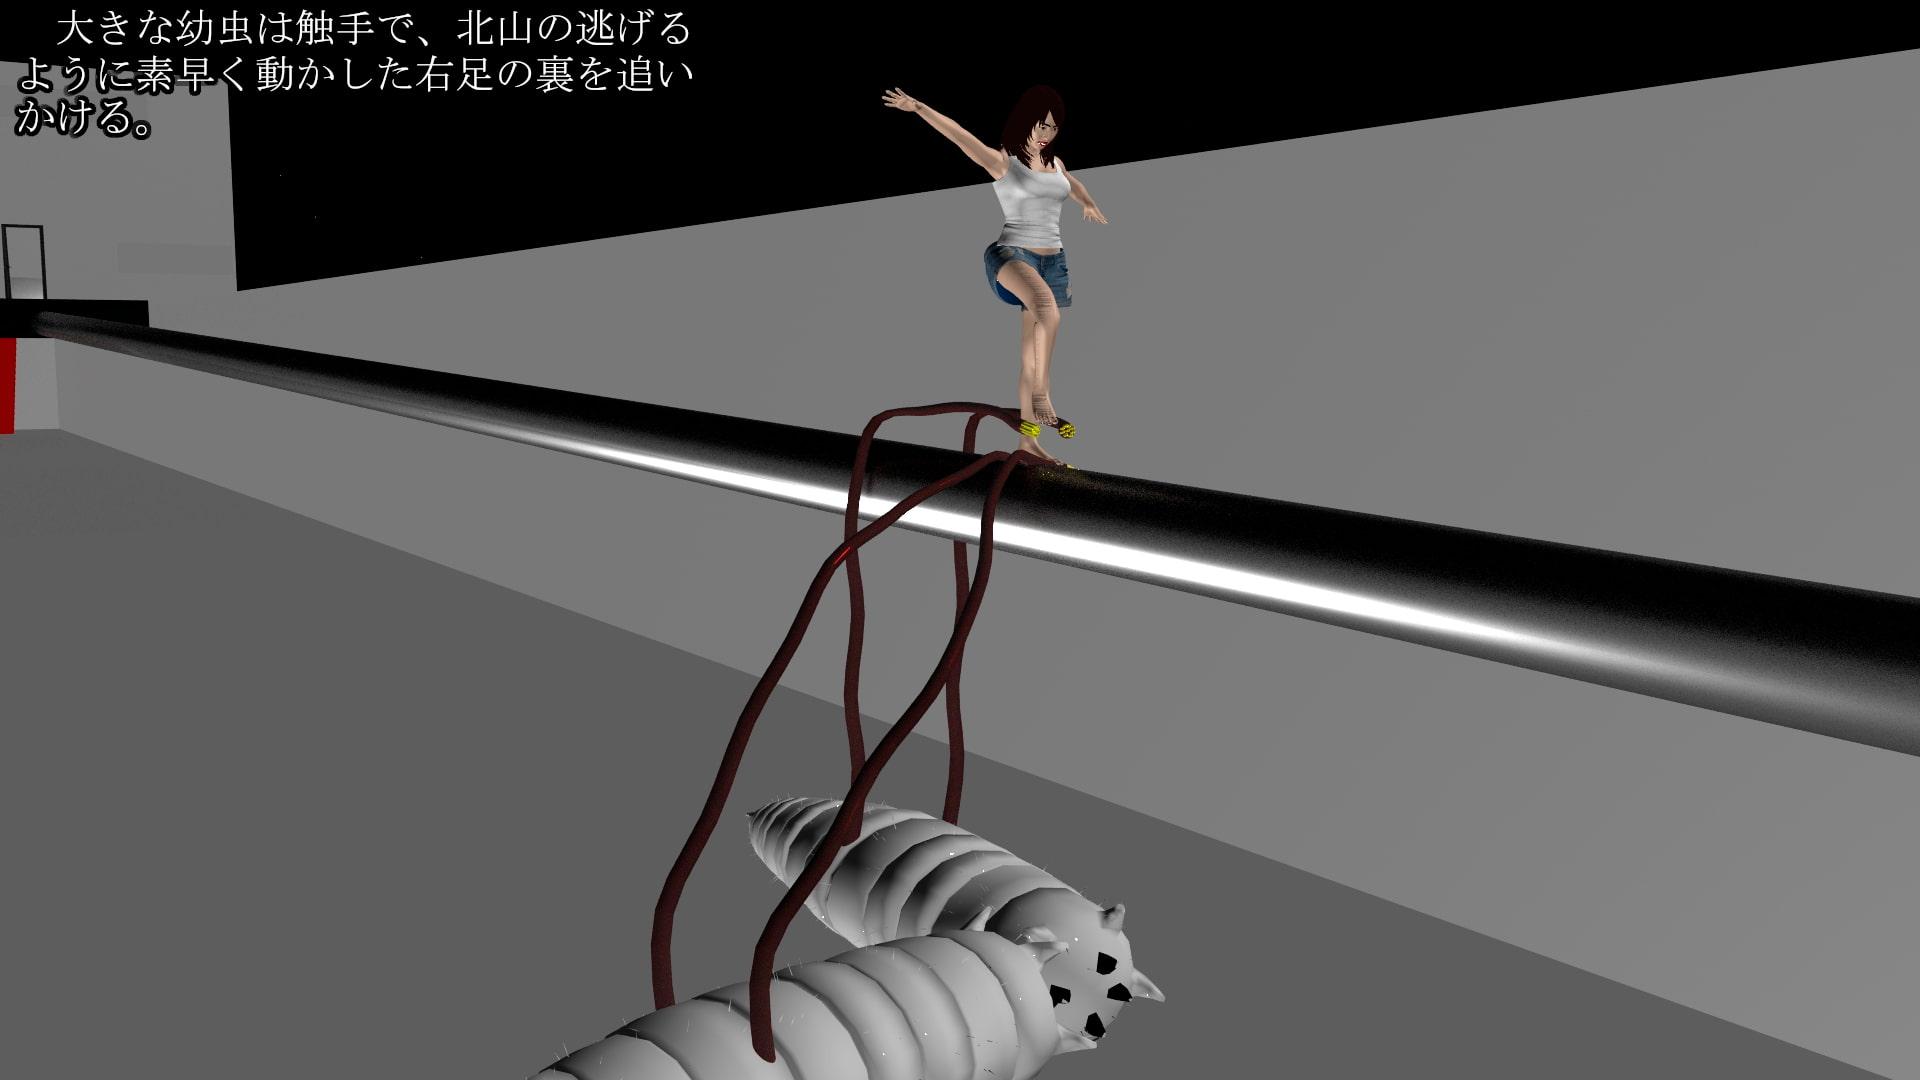 RJ317296 足フェチアトラクション 第1試練 鉄柱渡り [20210212]